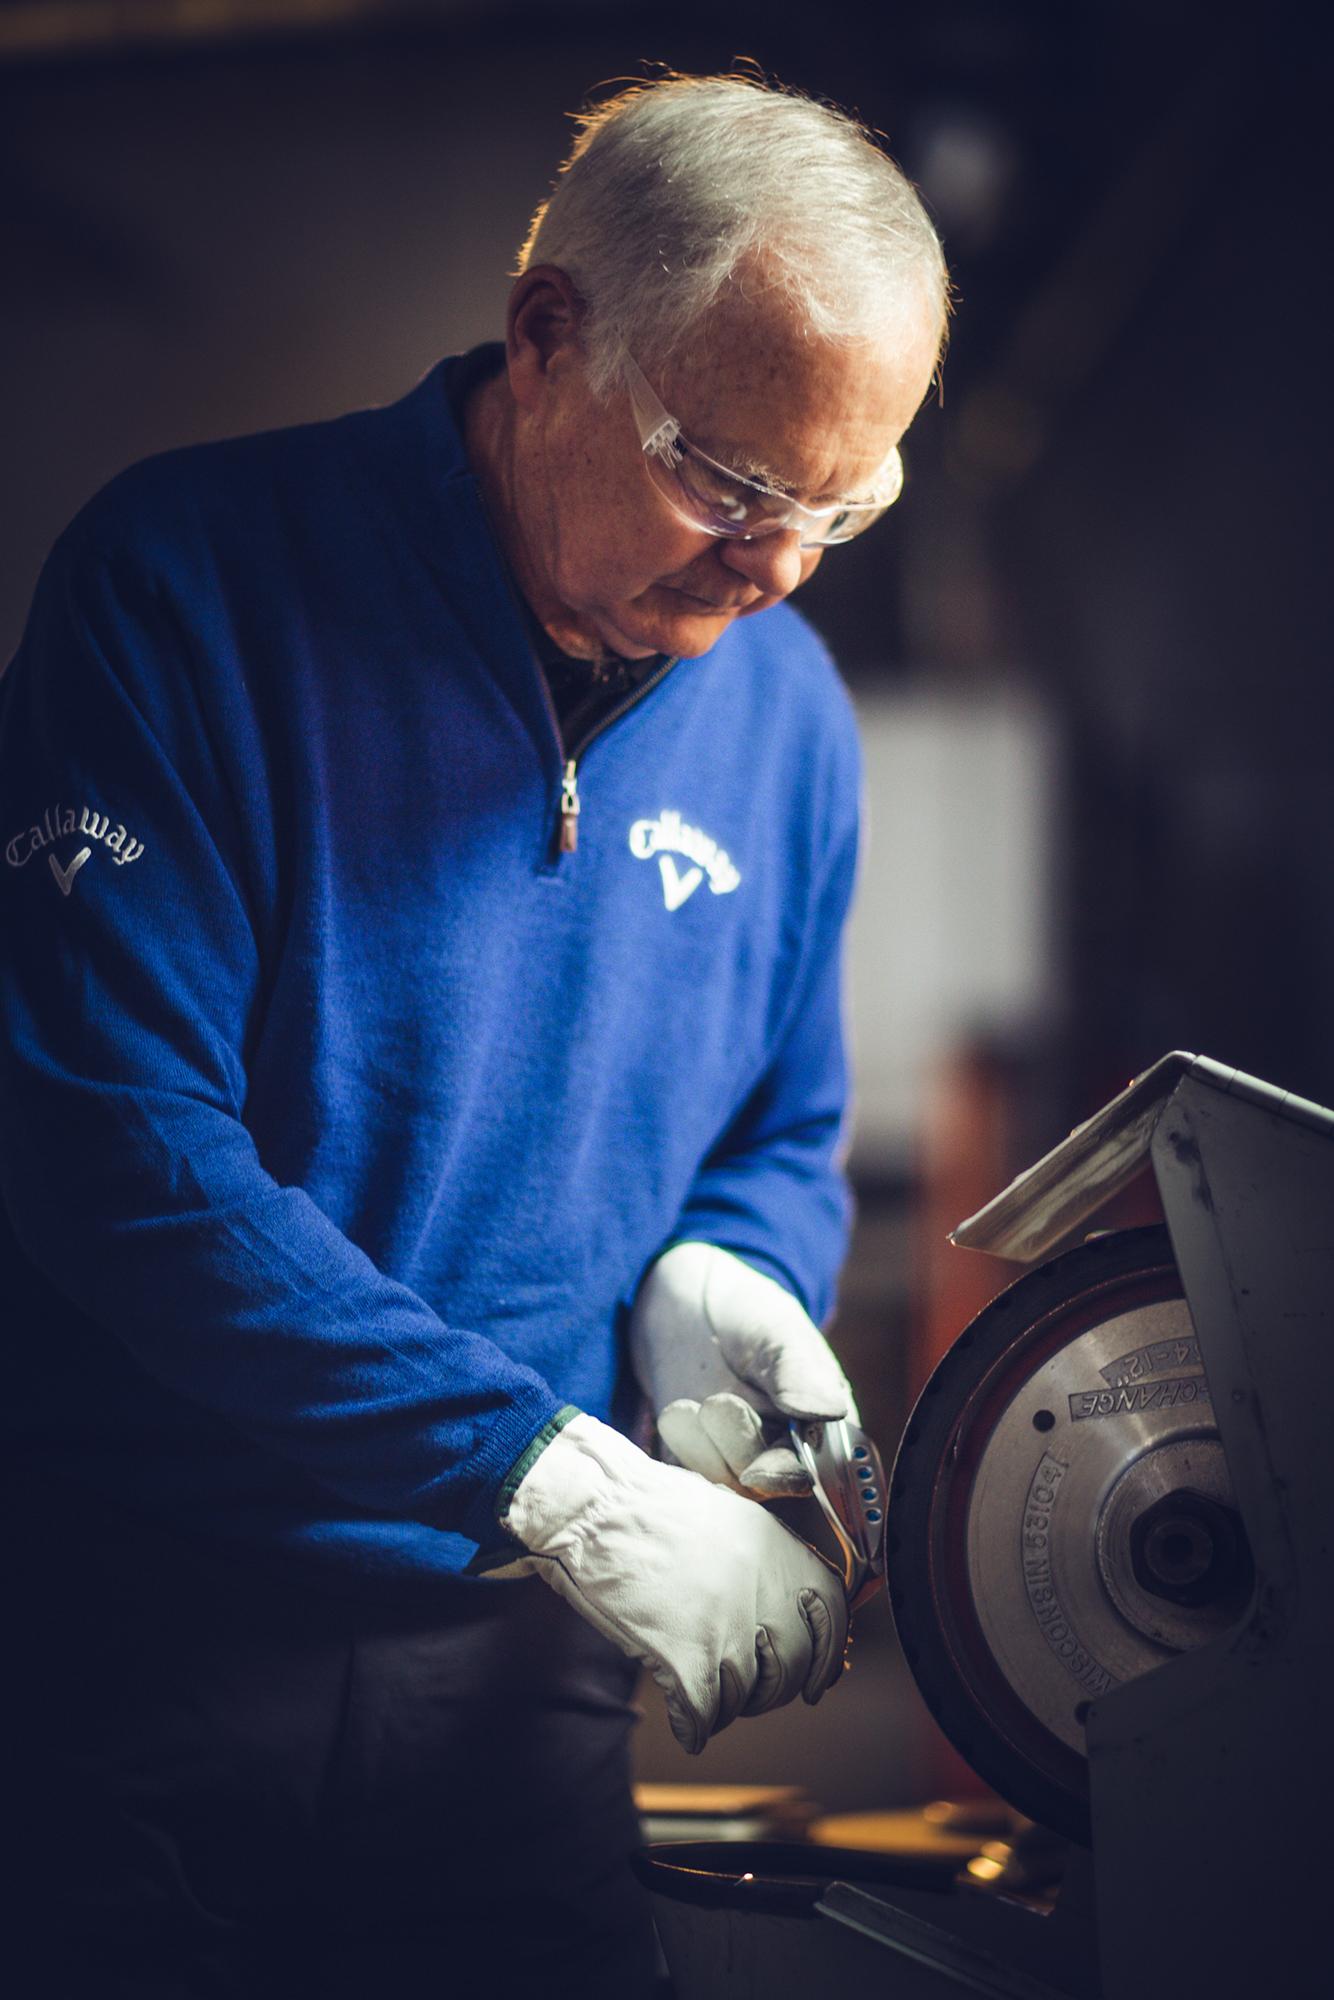 Roger Cleveland grinding MD5 Wedge